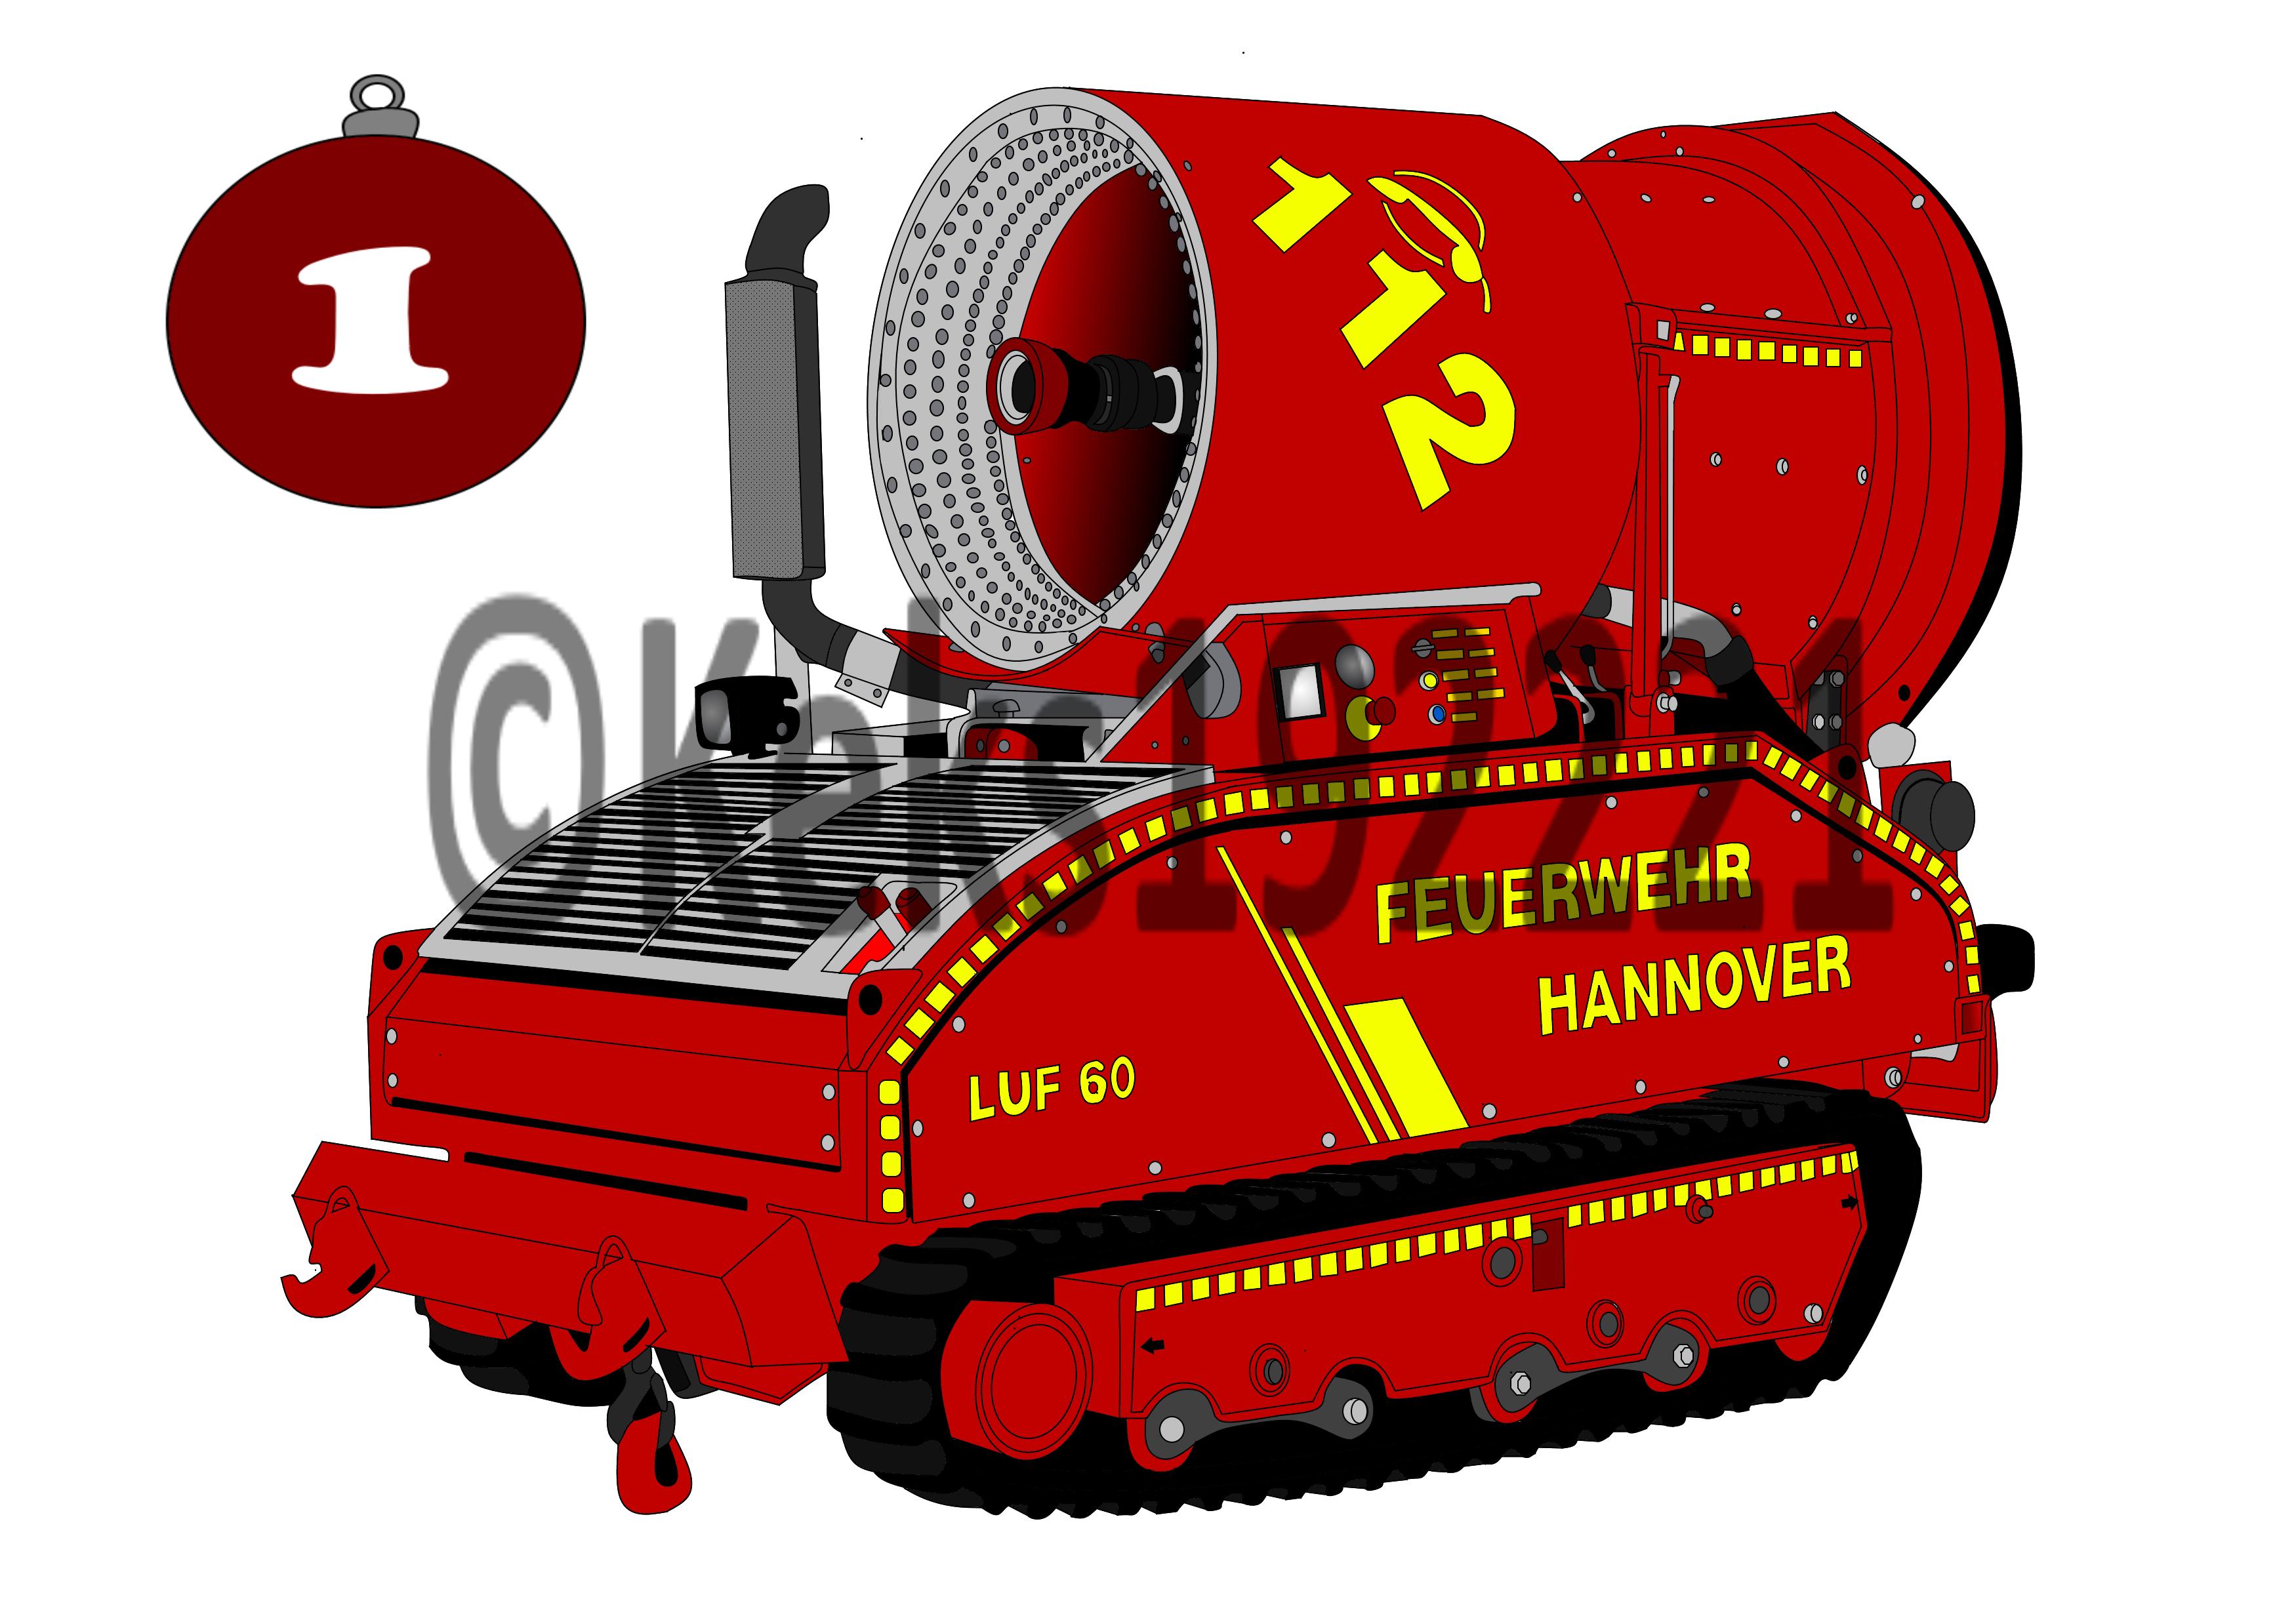 69527-luf-60-hannover-vorschau-t%C3%BCr-1-png